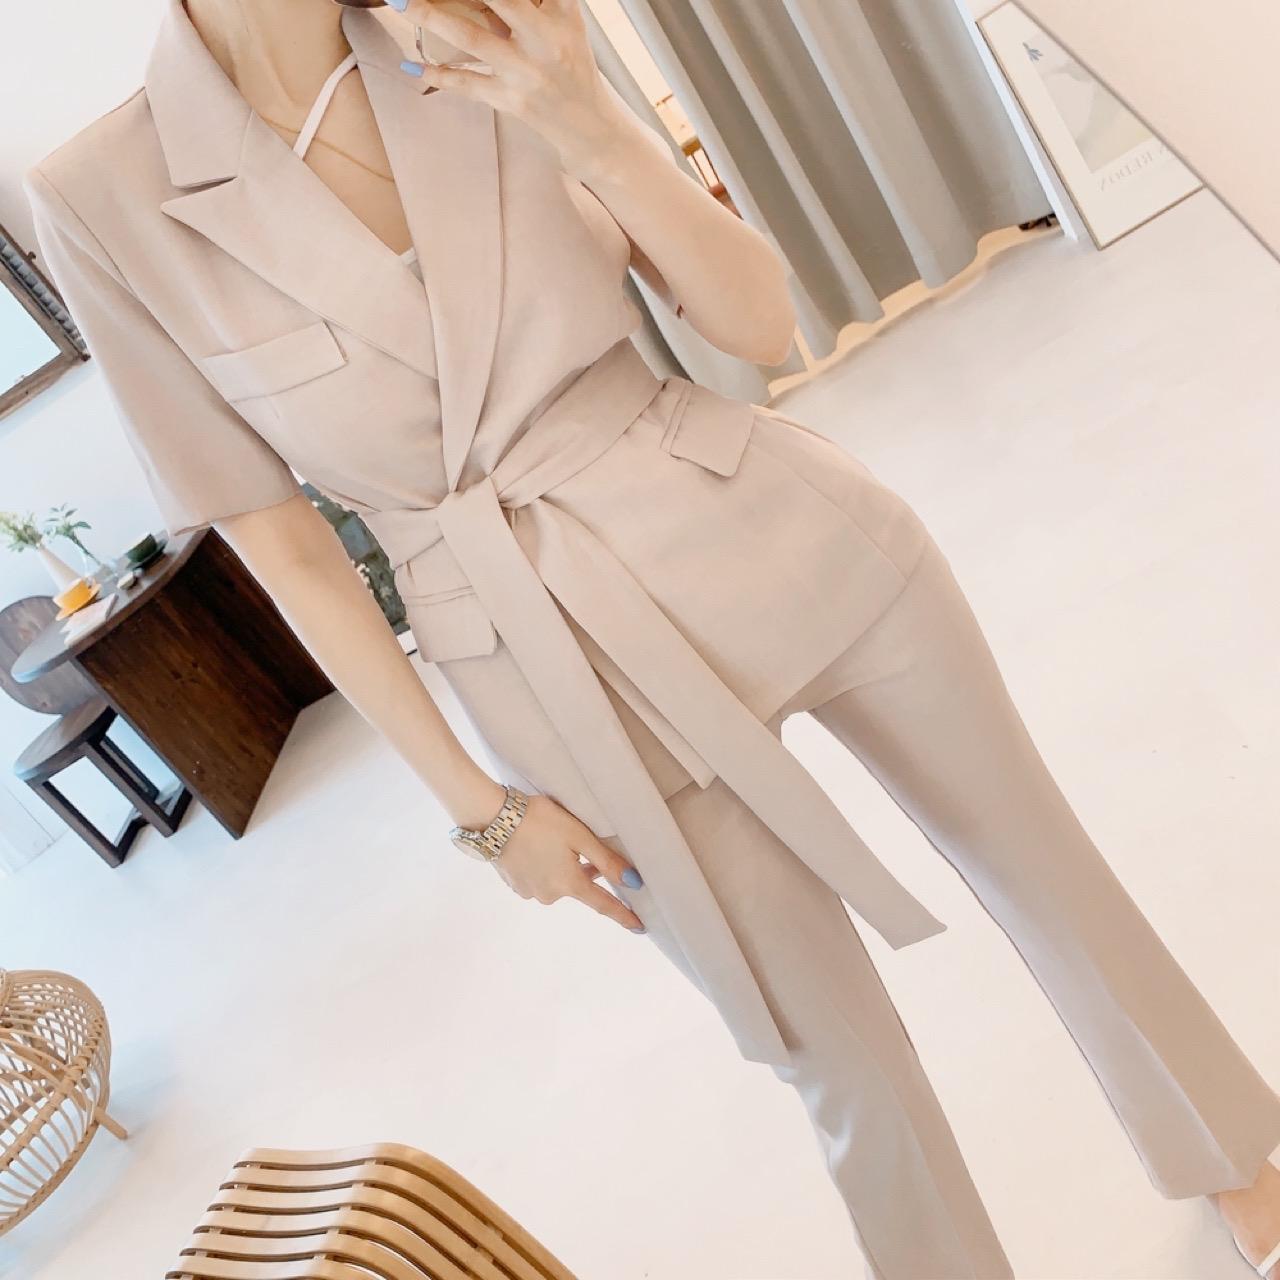 uinme-로즈 린넨 투피스 SET - [ 3color ] - 유인미로즈 린넨 투피스 SET - [ 3color ] - 유인미♡韓國女裝套裝